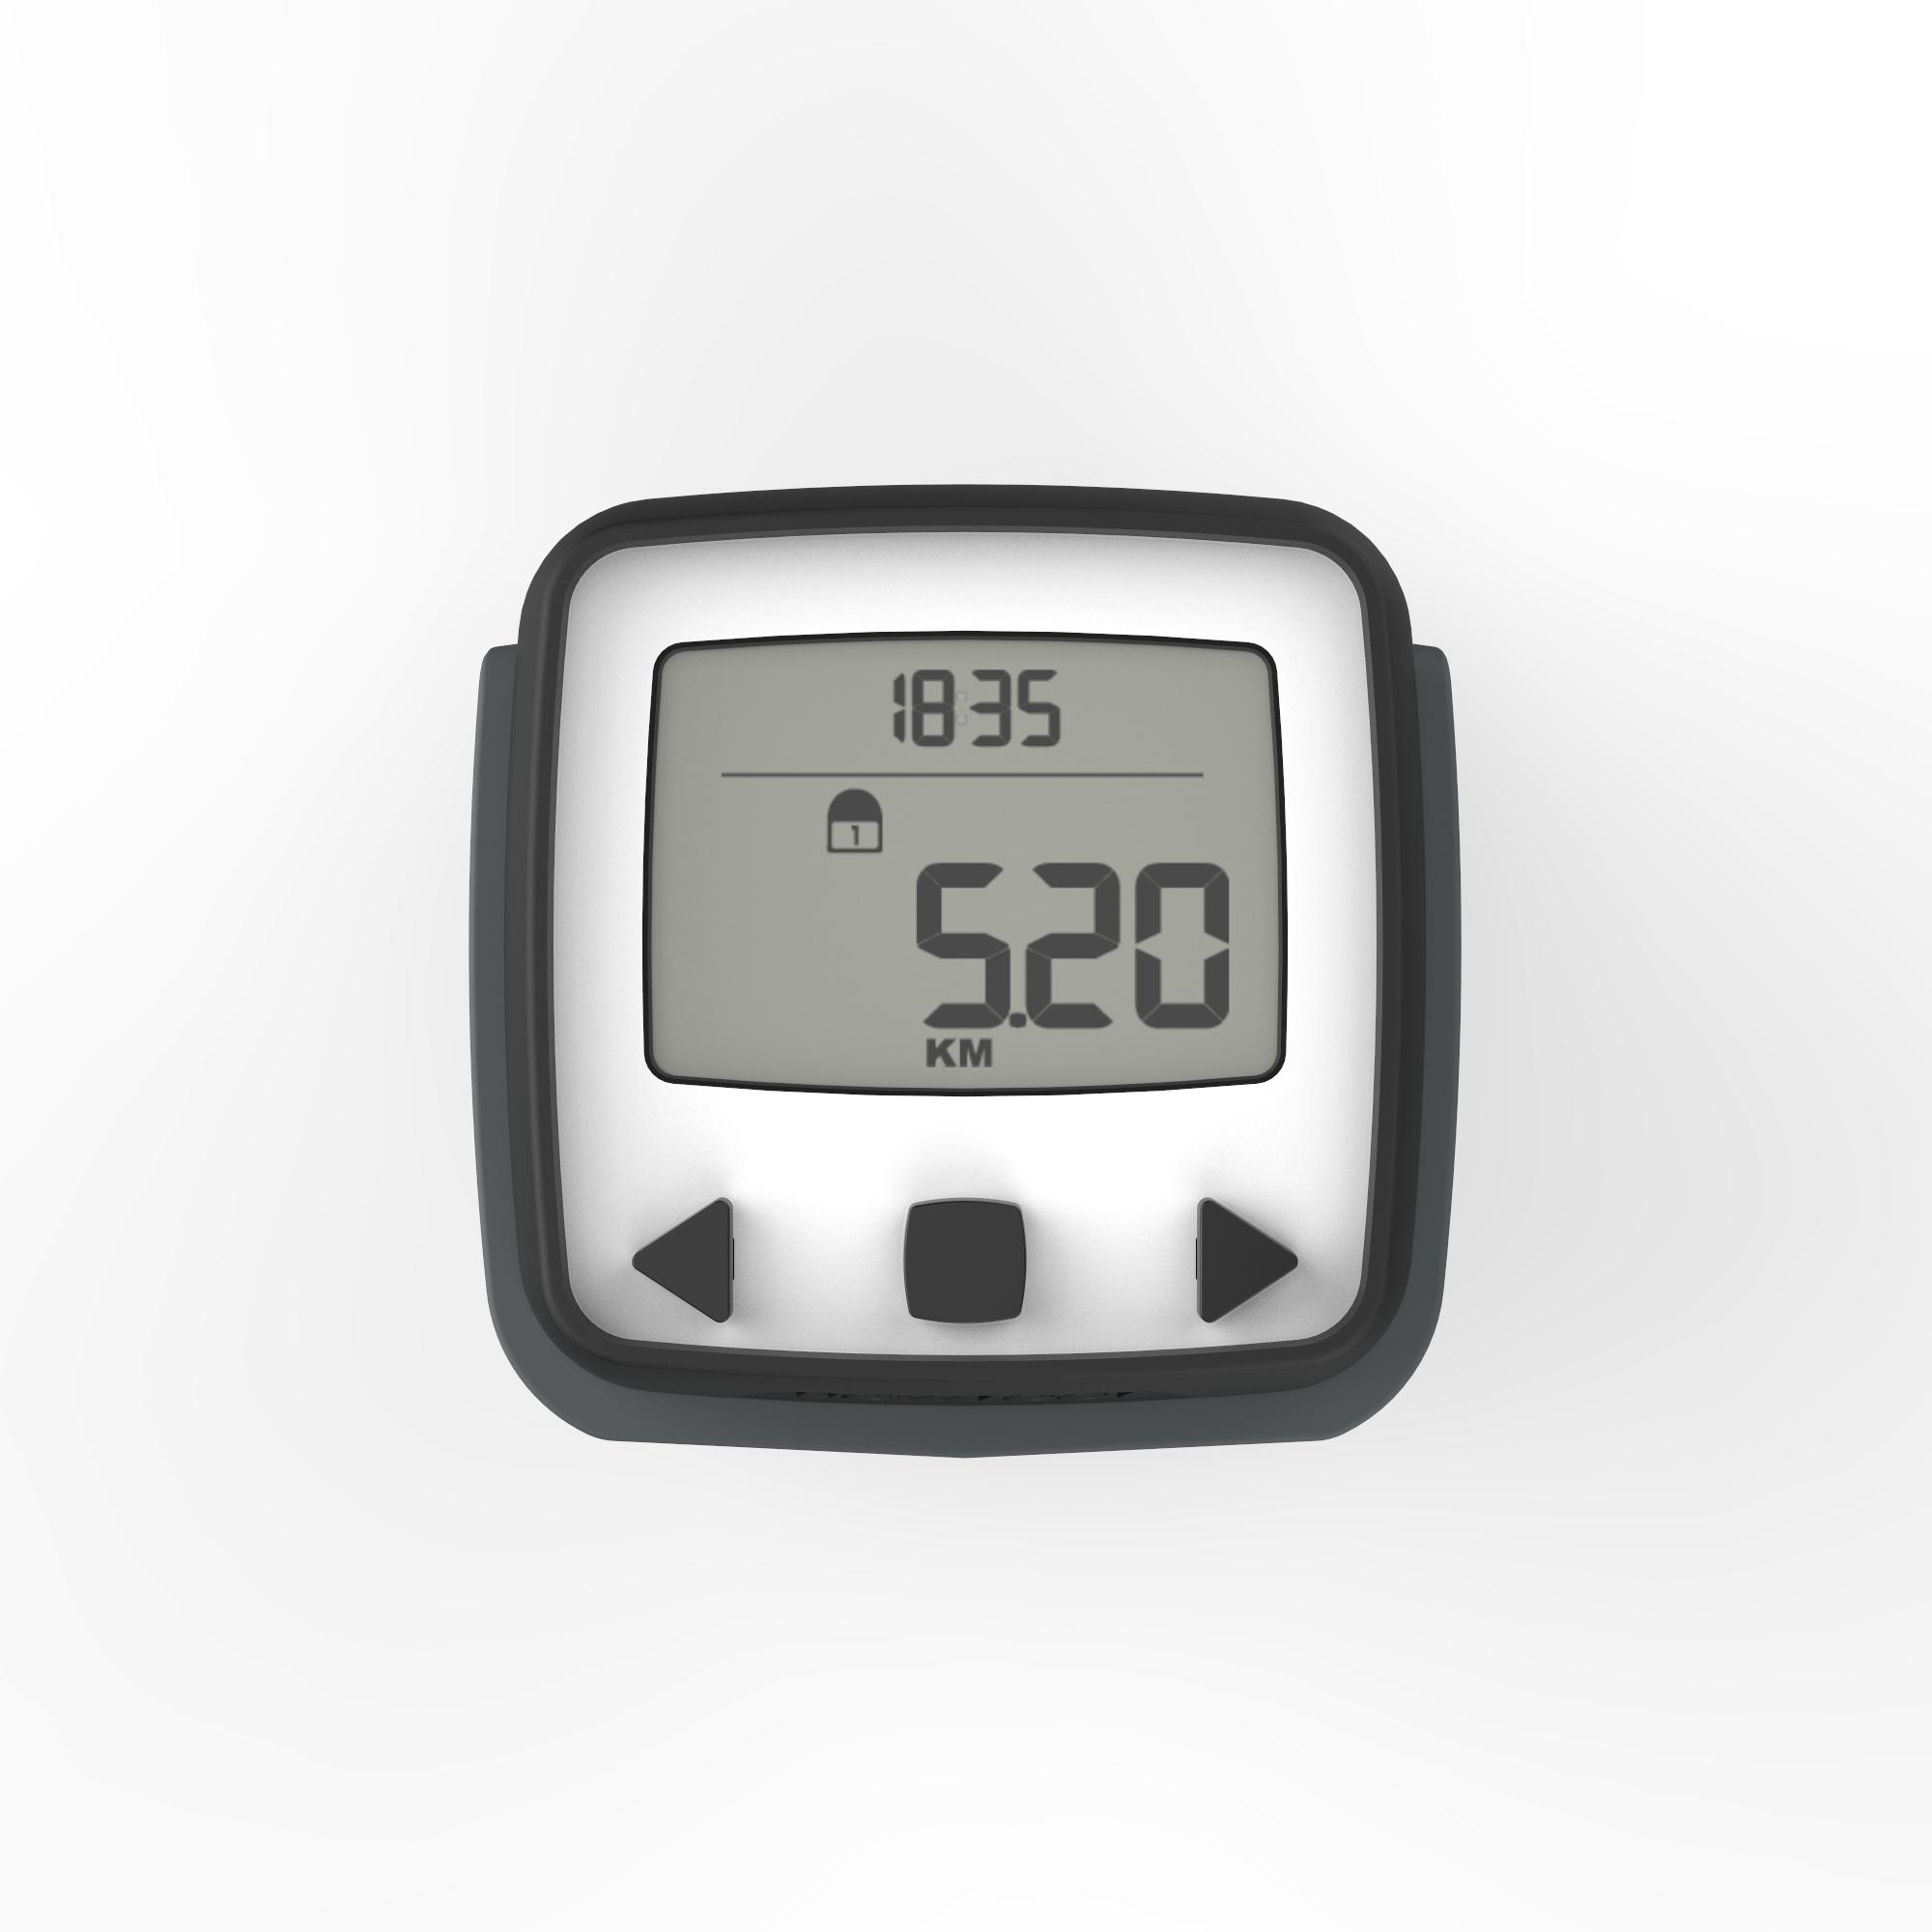 ONwalk 500 Accelerometer Pedometer Black